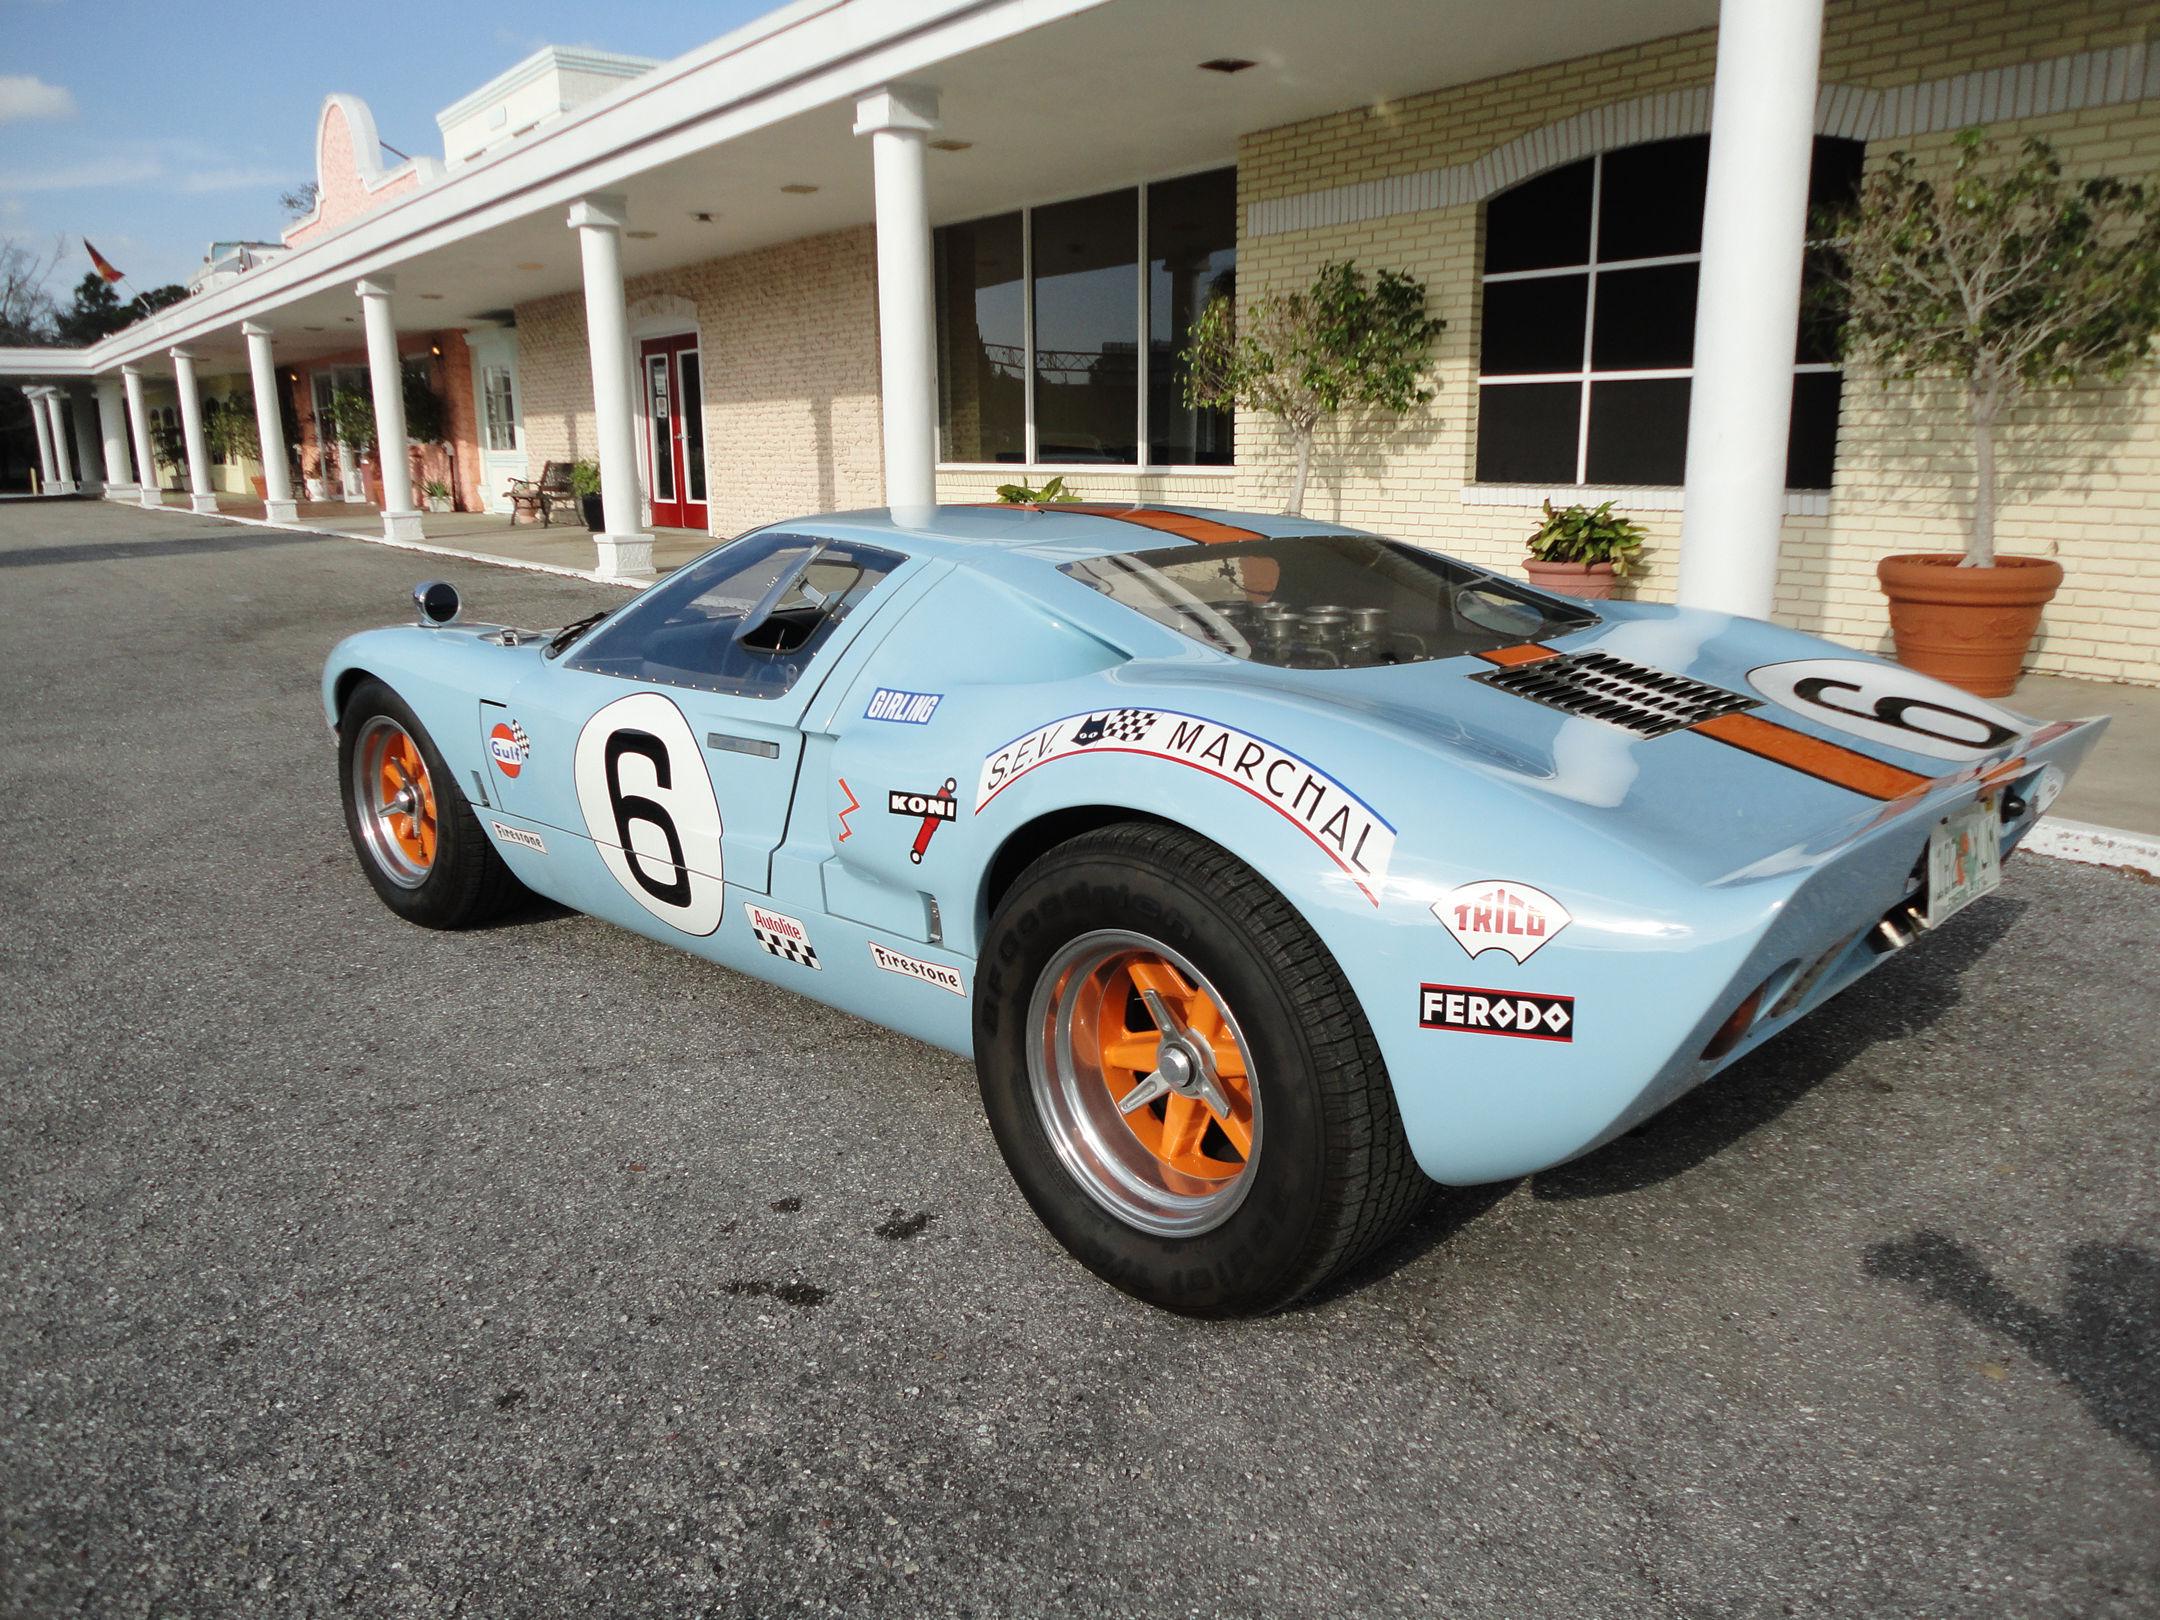 1966 ford gt40 cav replica supercar race racing g t h wallpaper 2160x1620 174163 wallpaperup - 1966 Ford Gt40 Interior